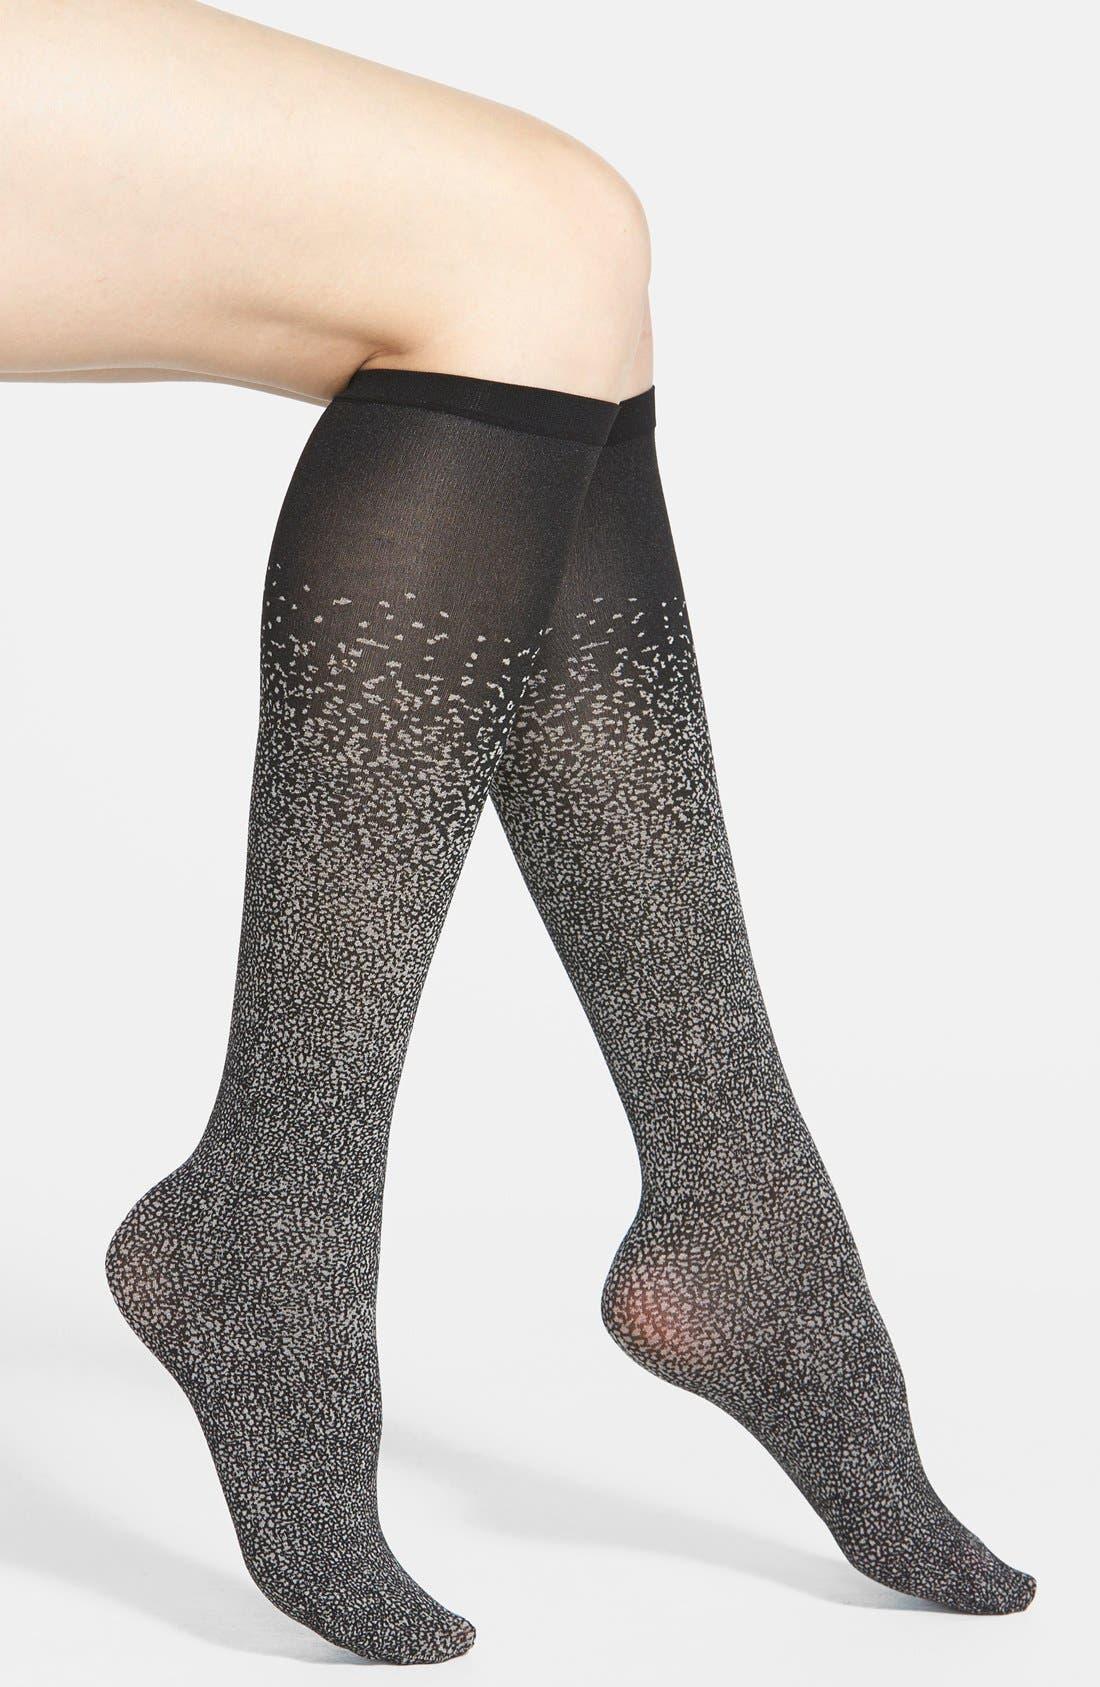 Main Image - Oroblu 'Elixer' Knee High Socks